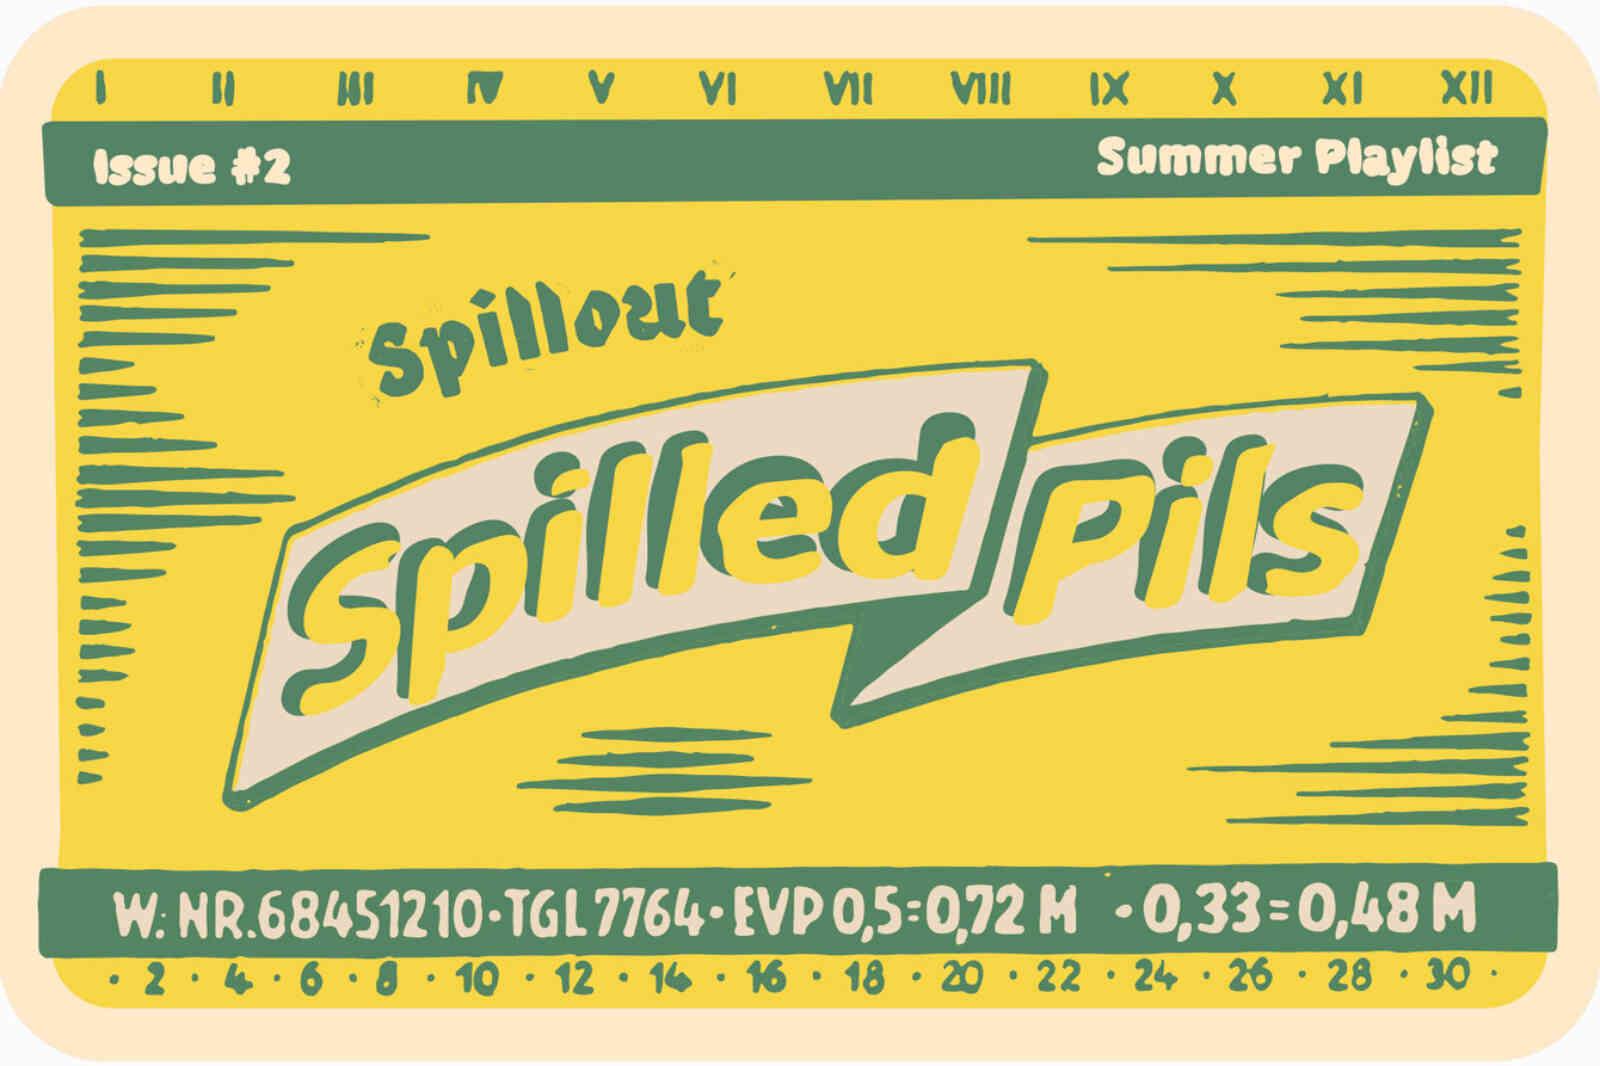 Playlist Summer Spilled Pils 1340